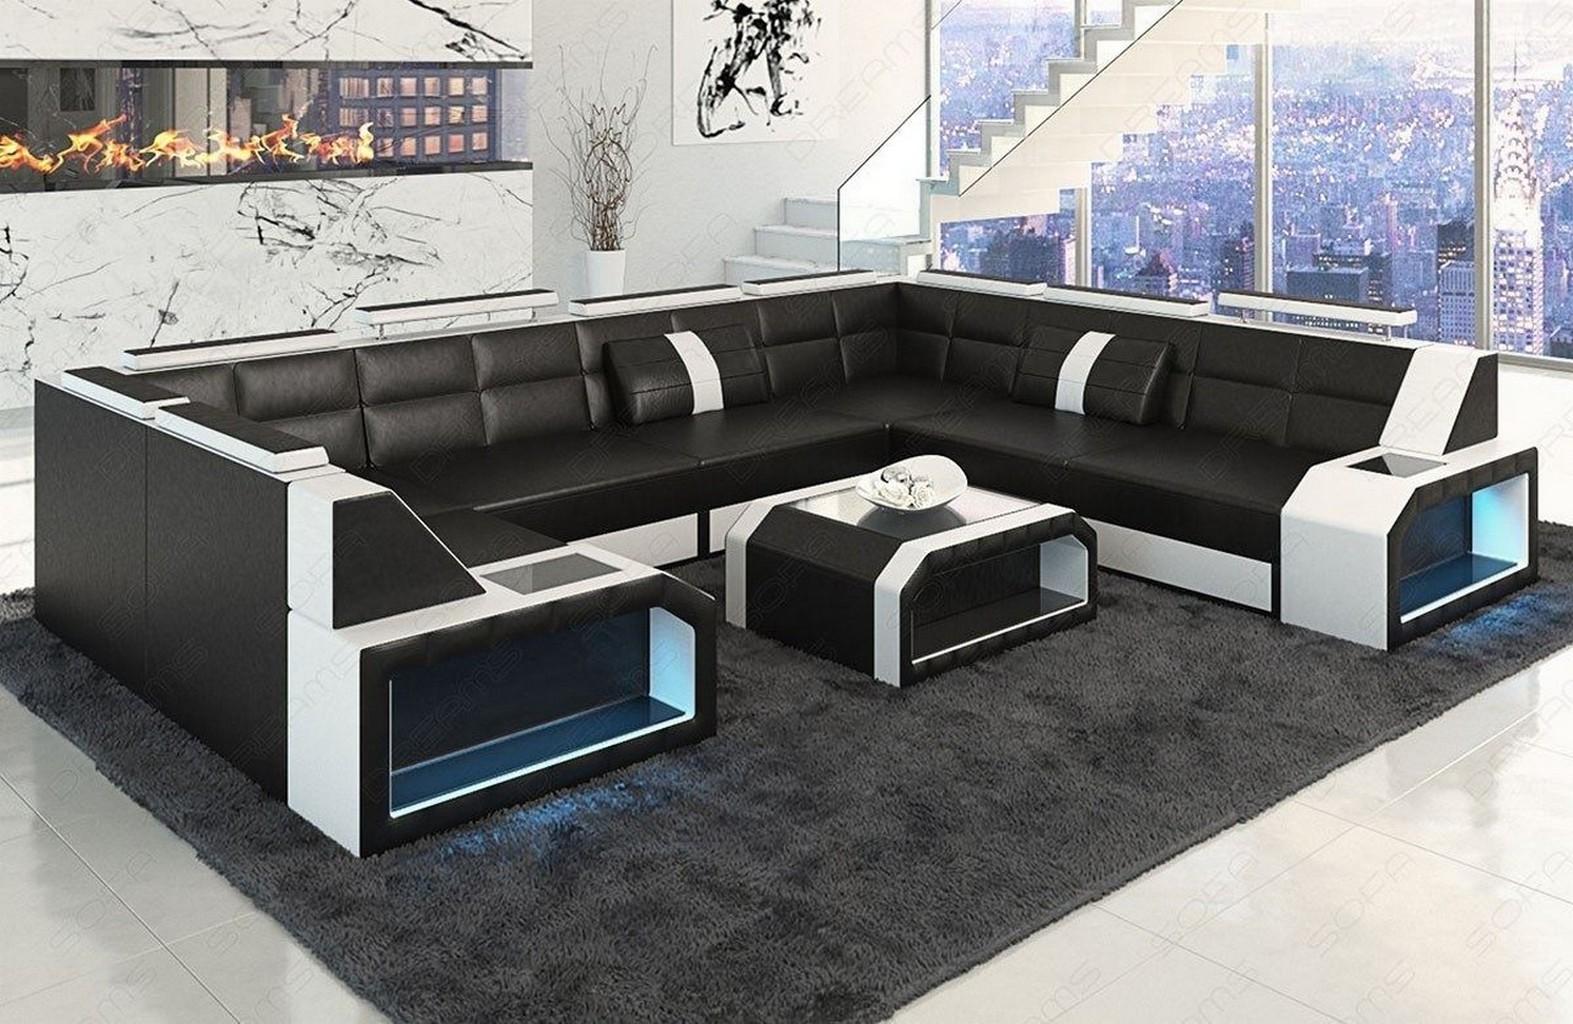 leather sofa corner couch sofa set pesaro xl u shaped. Black Bedroom Furniture Sets. Home Design Ideas